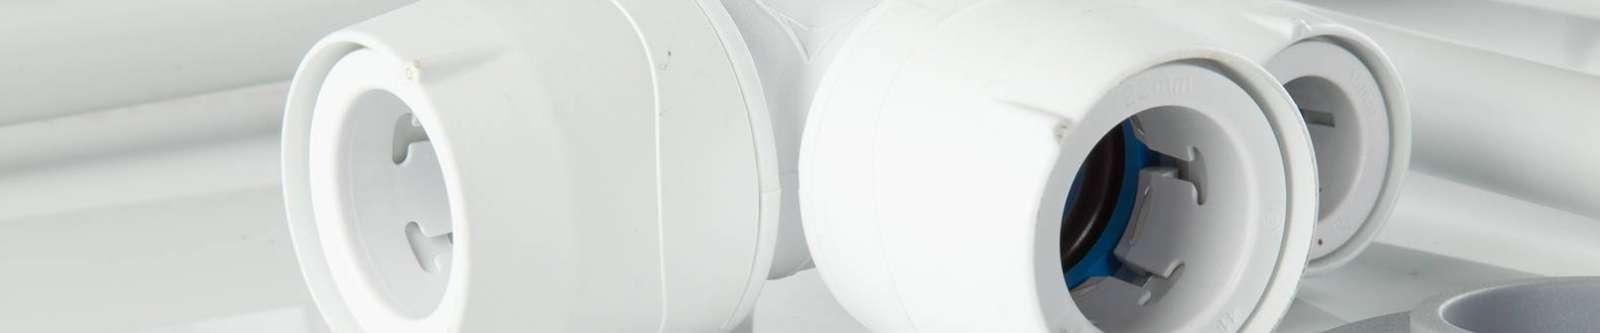 Plastic Plumbing System - Polymax